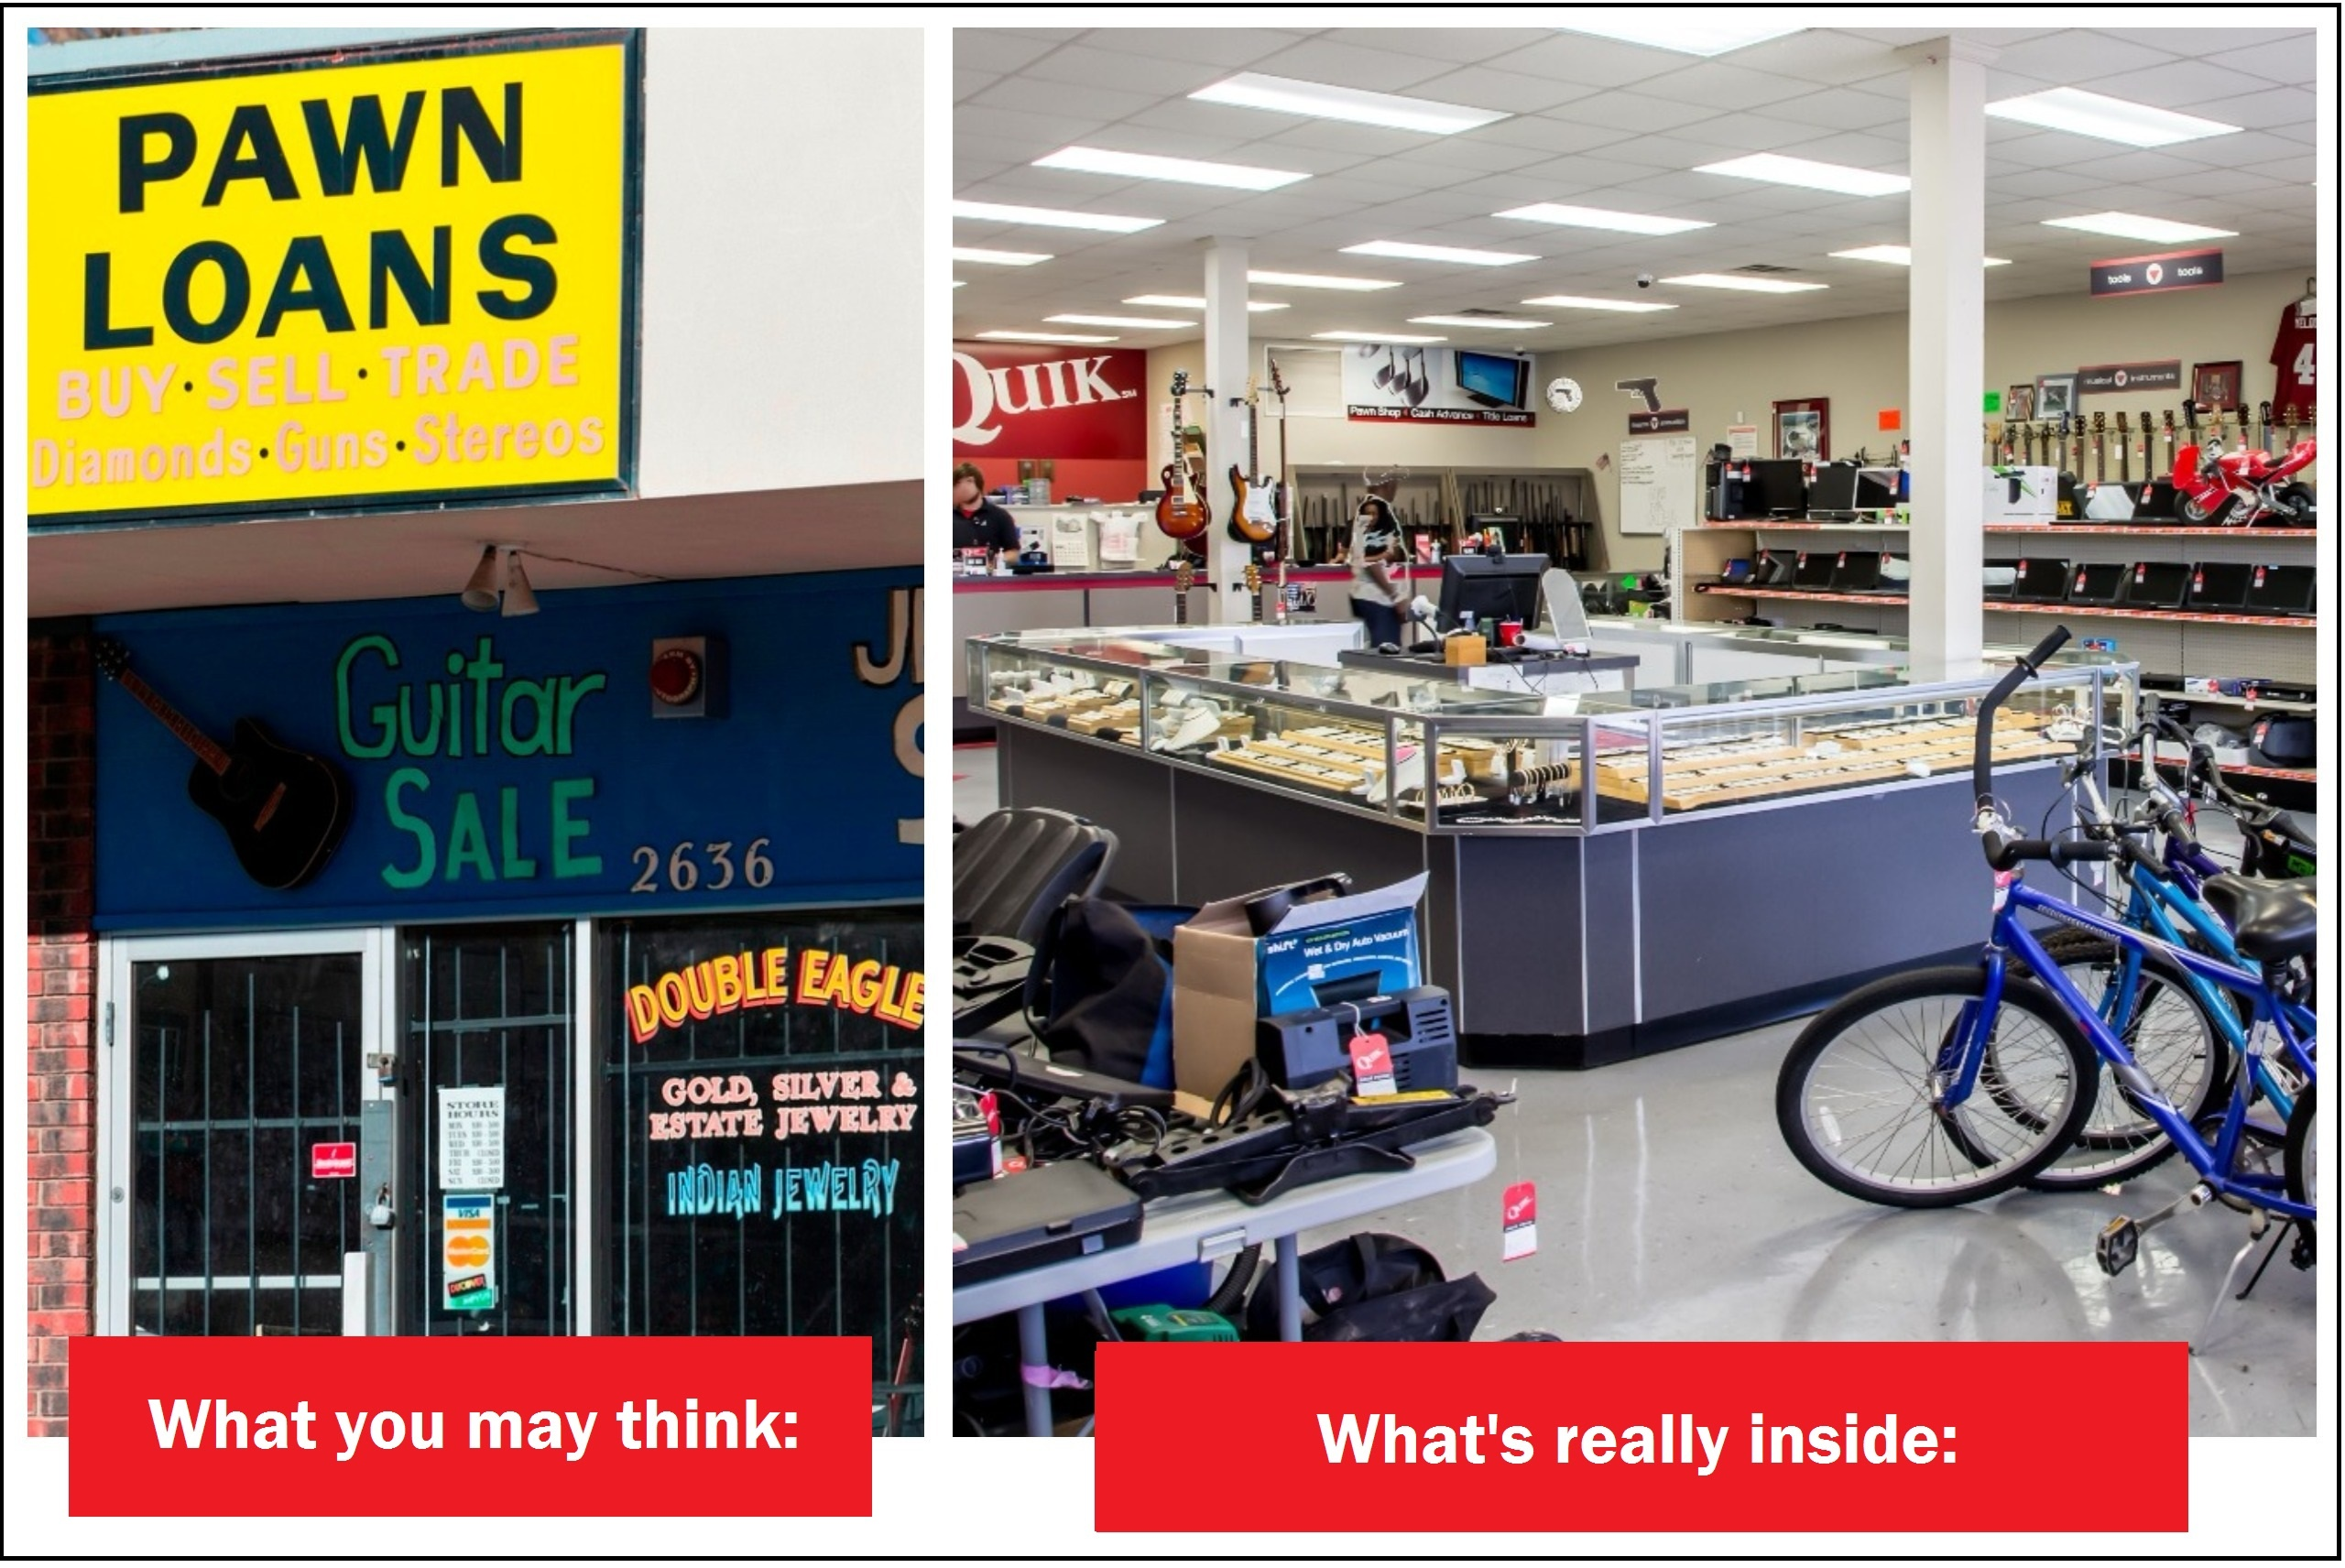 quik-pawn-shop-store-view